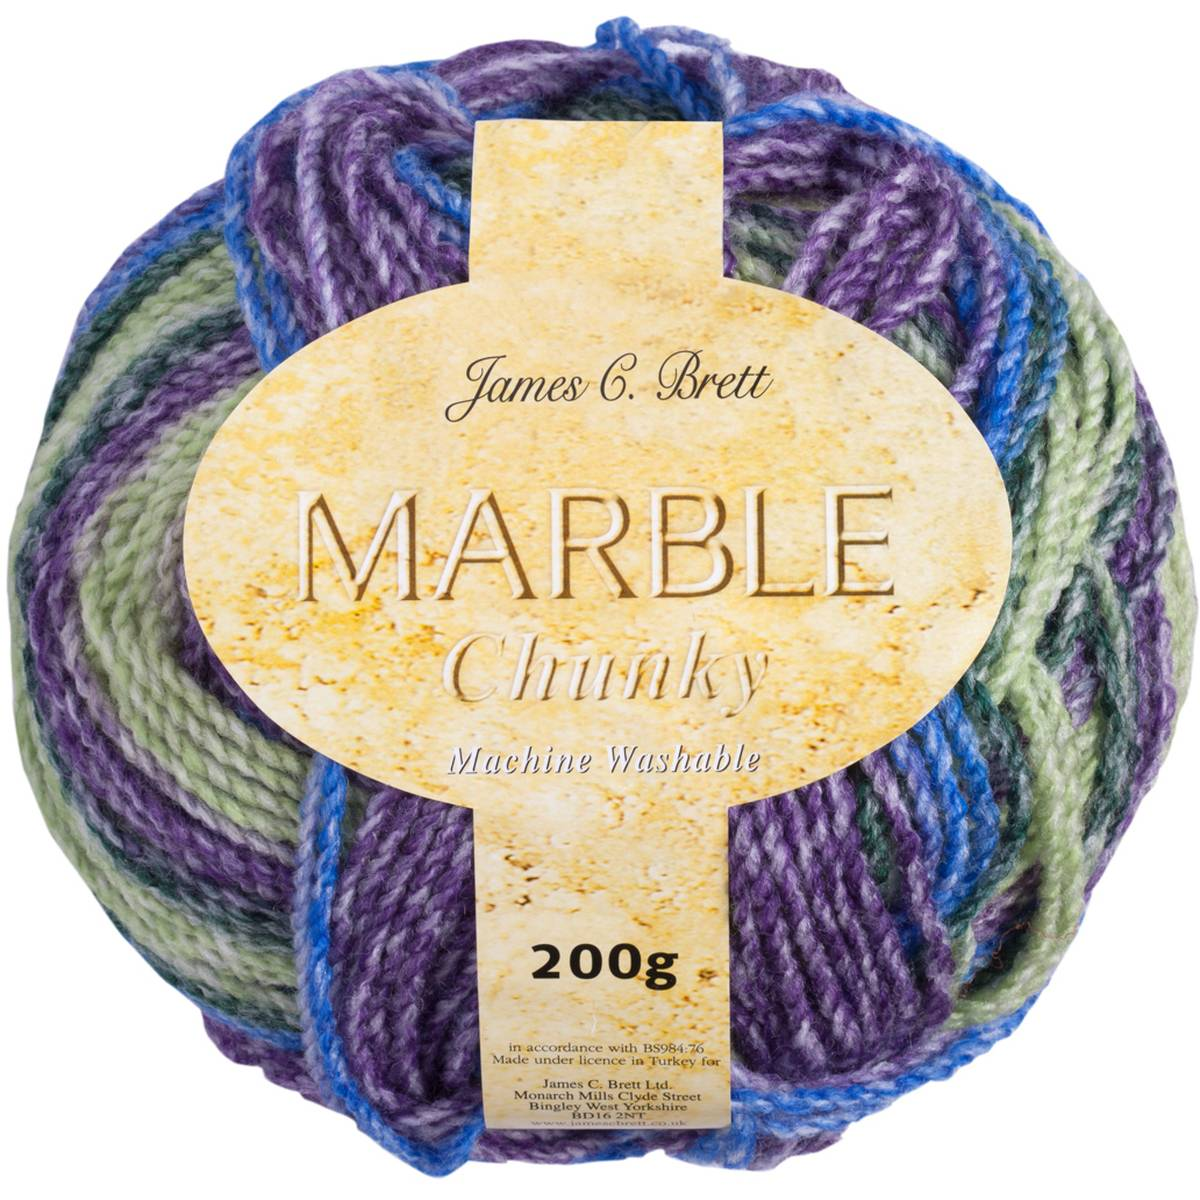 James C Brett Marble Chunky product image